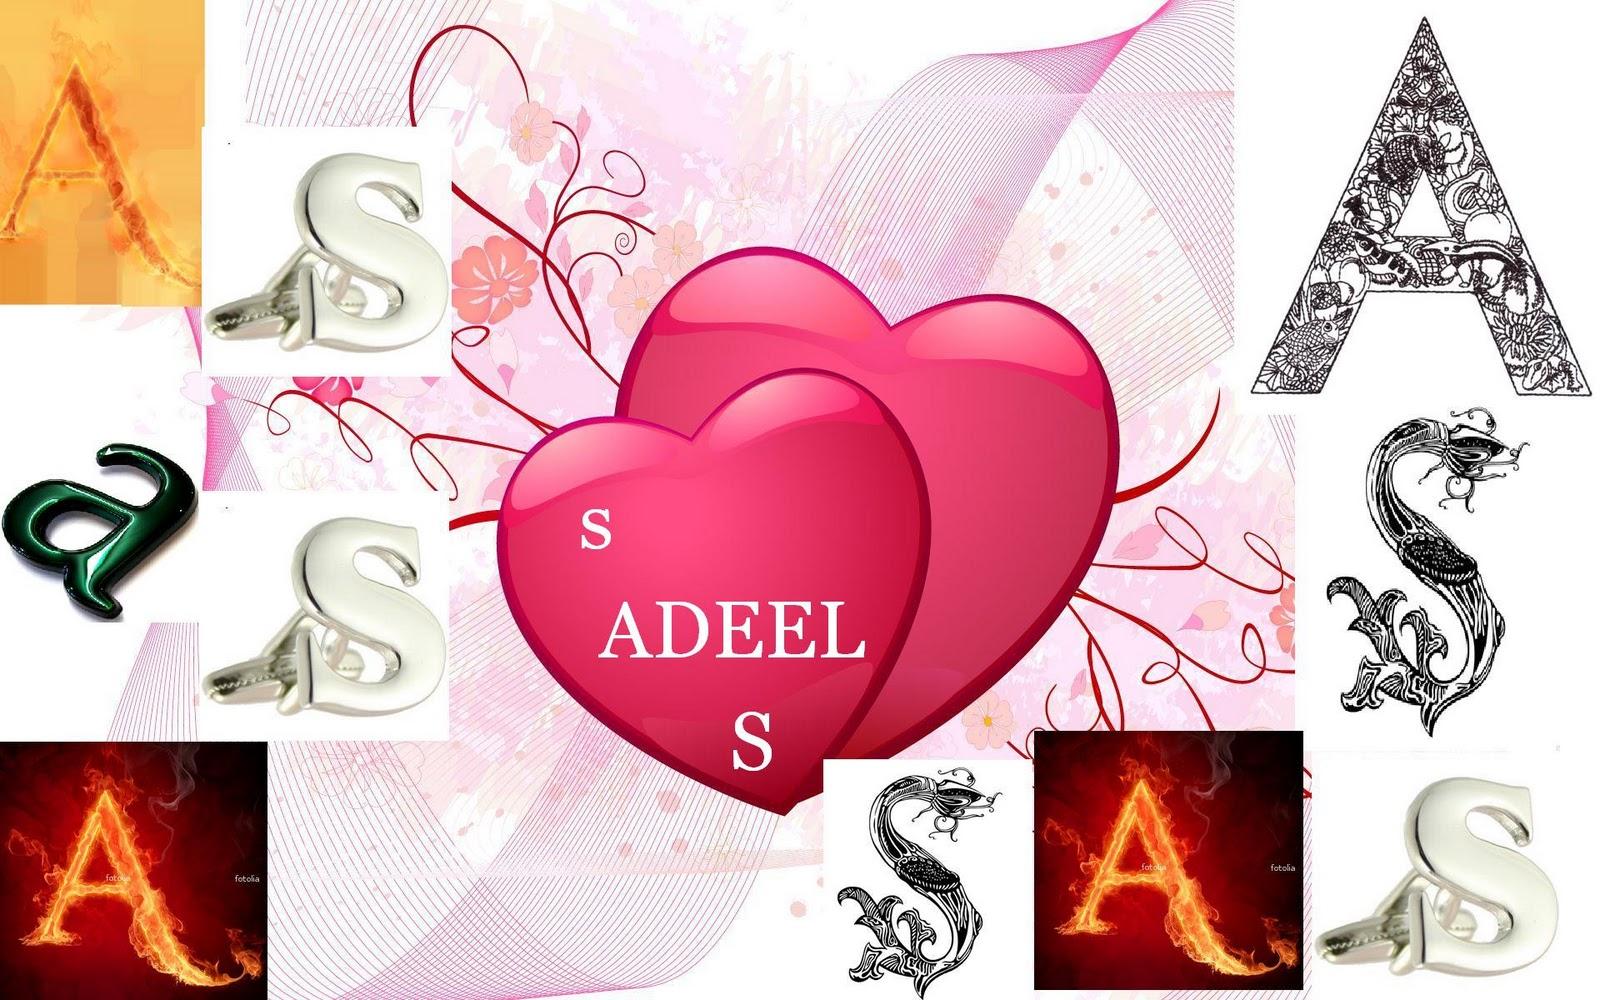 http://2.bp.blogspot.com/-WOOjPiMvIuE/TZx-U-Bg8_I/AAAAAAAAABE/7lKpYRpbCxI/s1600/Love-wallpaper-love-4187609-1920-1200.jpg